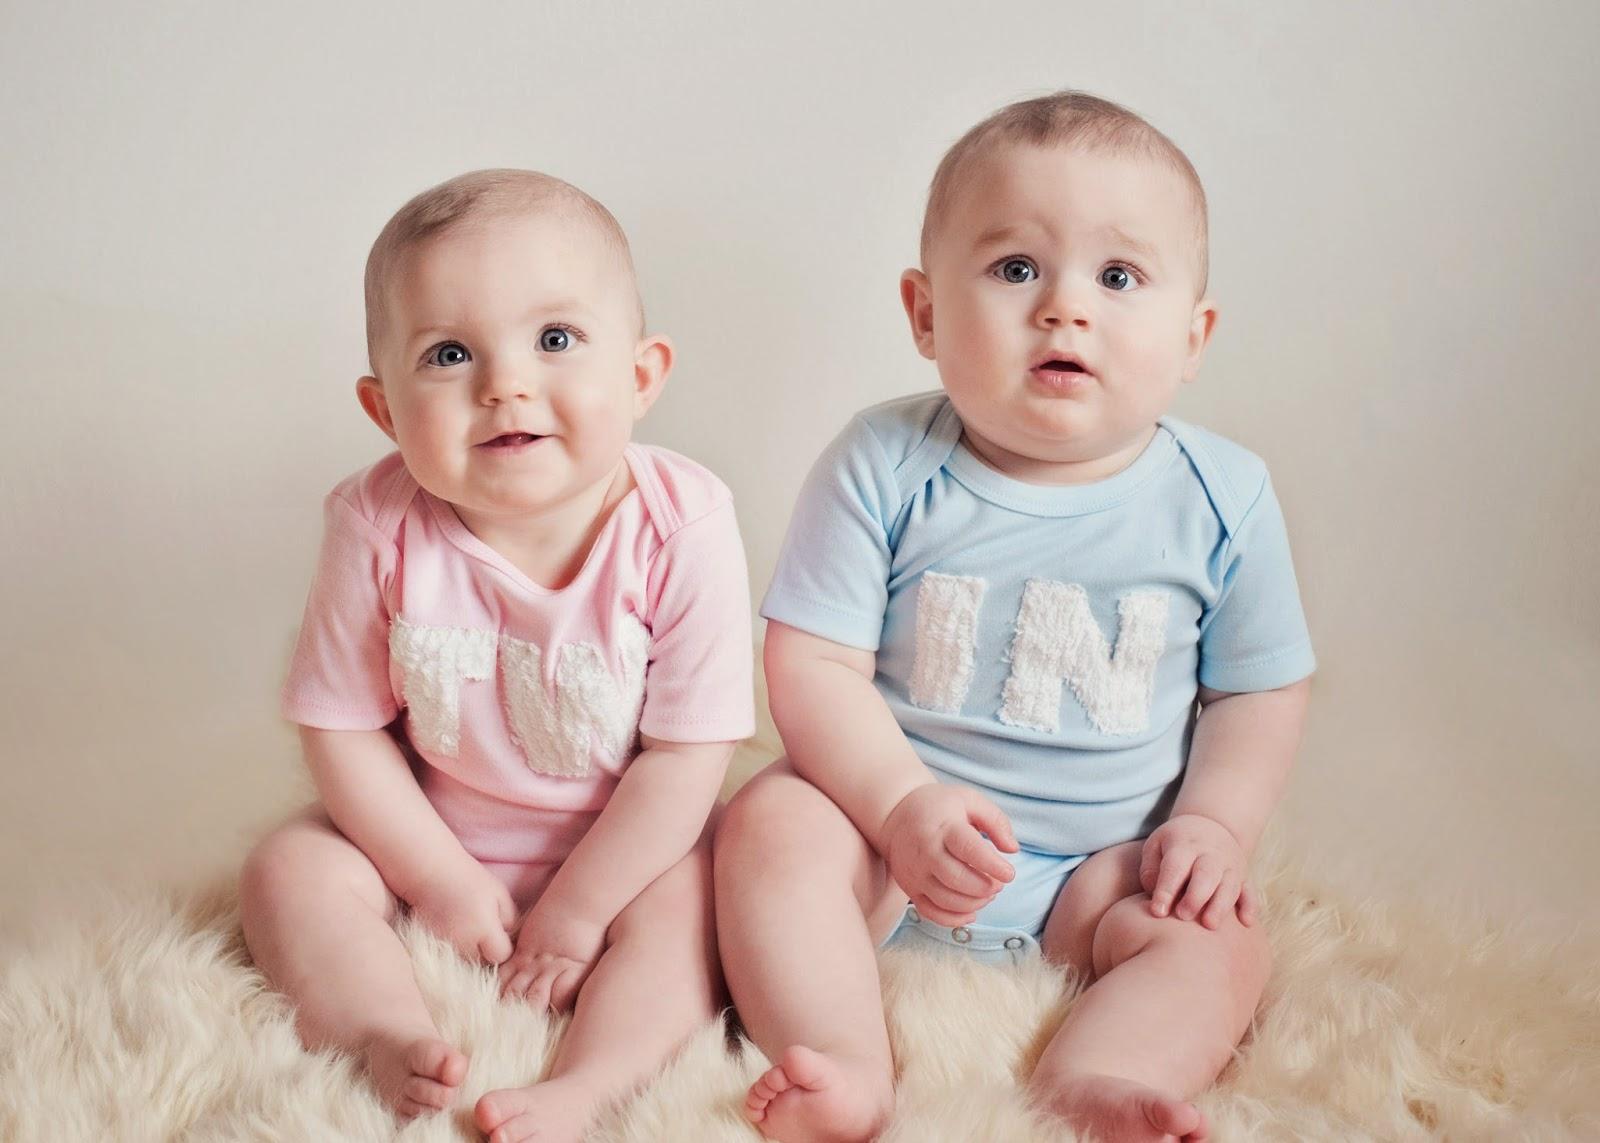 TANDA AWAL KEHAMILAN ANAK KEMBAR Gejala Tanda Hamil Bayi Kembar